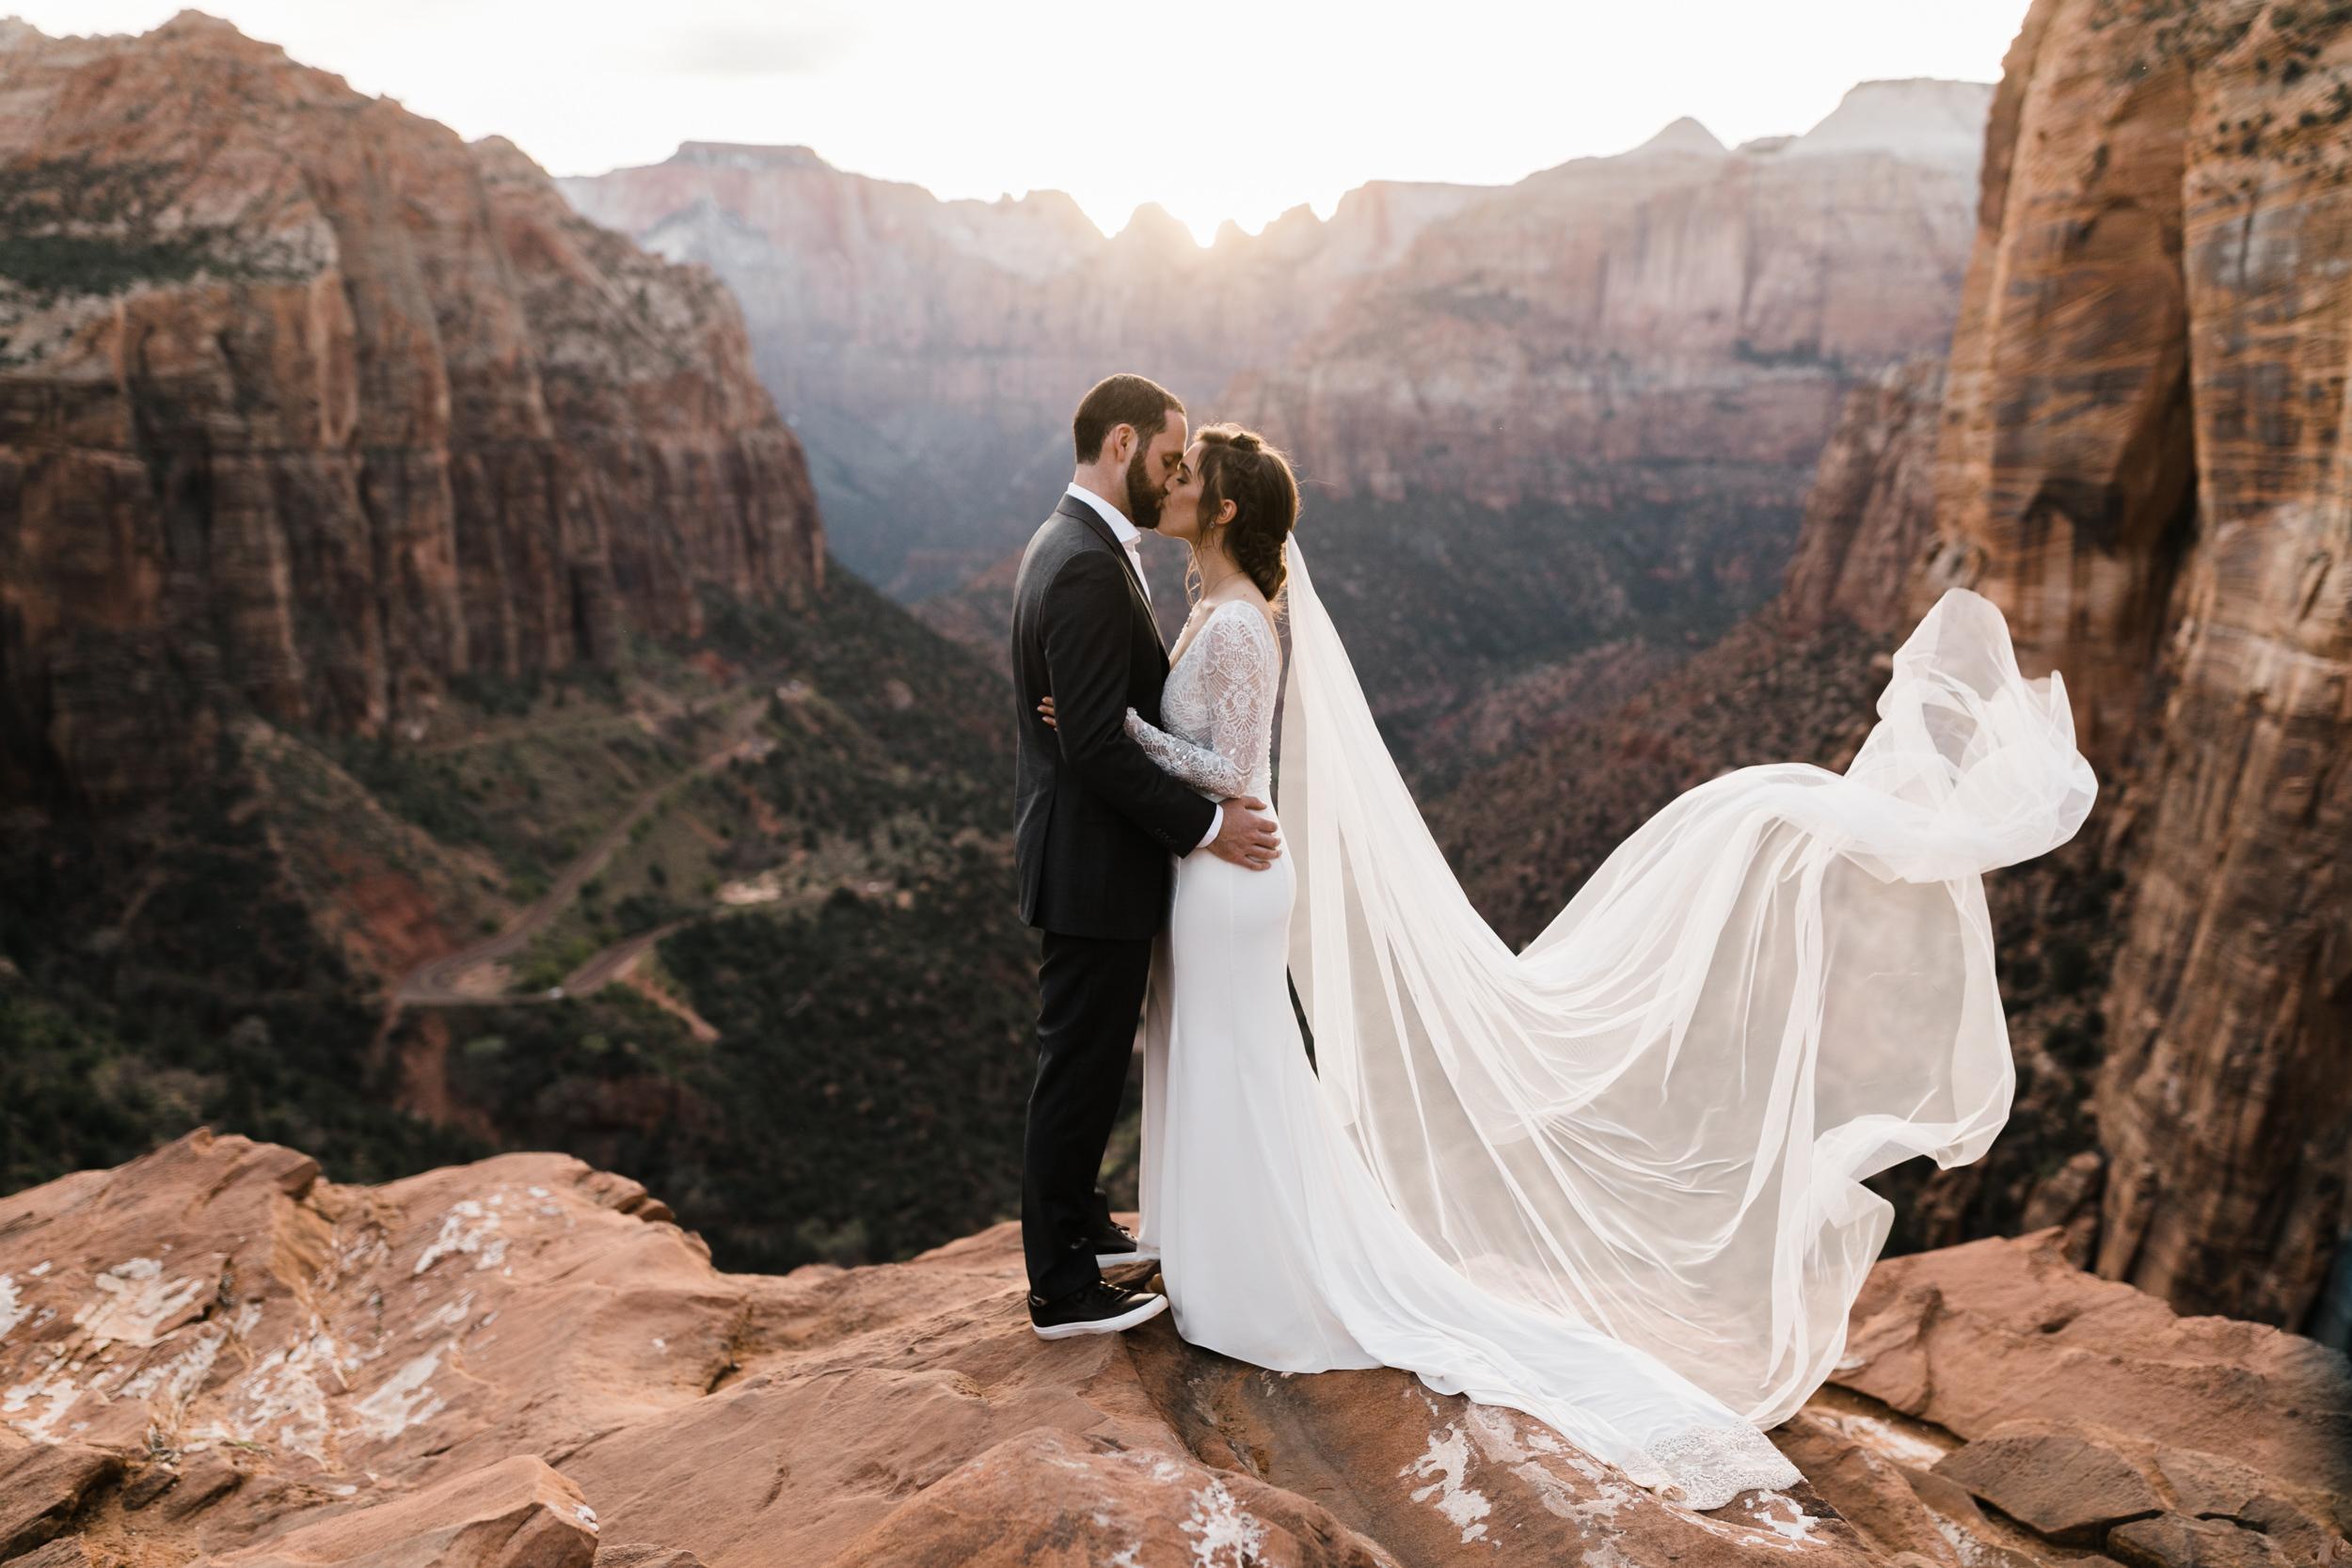 Zion-National-Park-Adventure-Wedding-Hearnes-Elopement-Photography-57.jpg